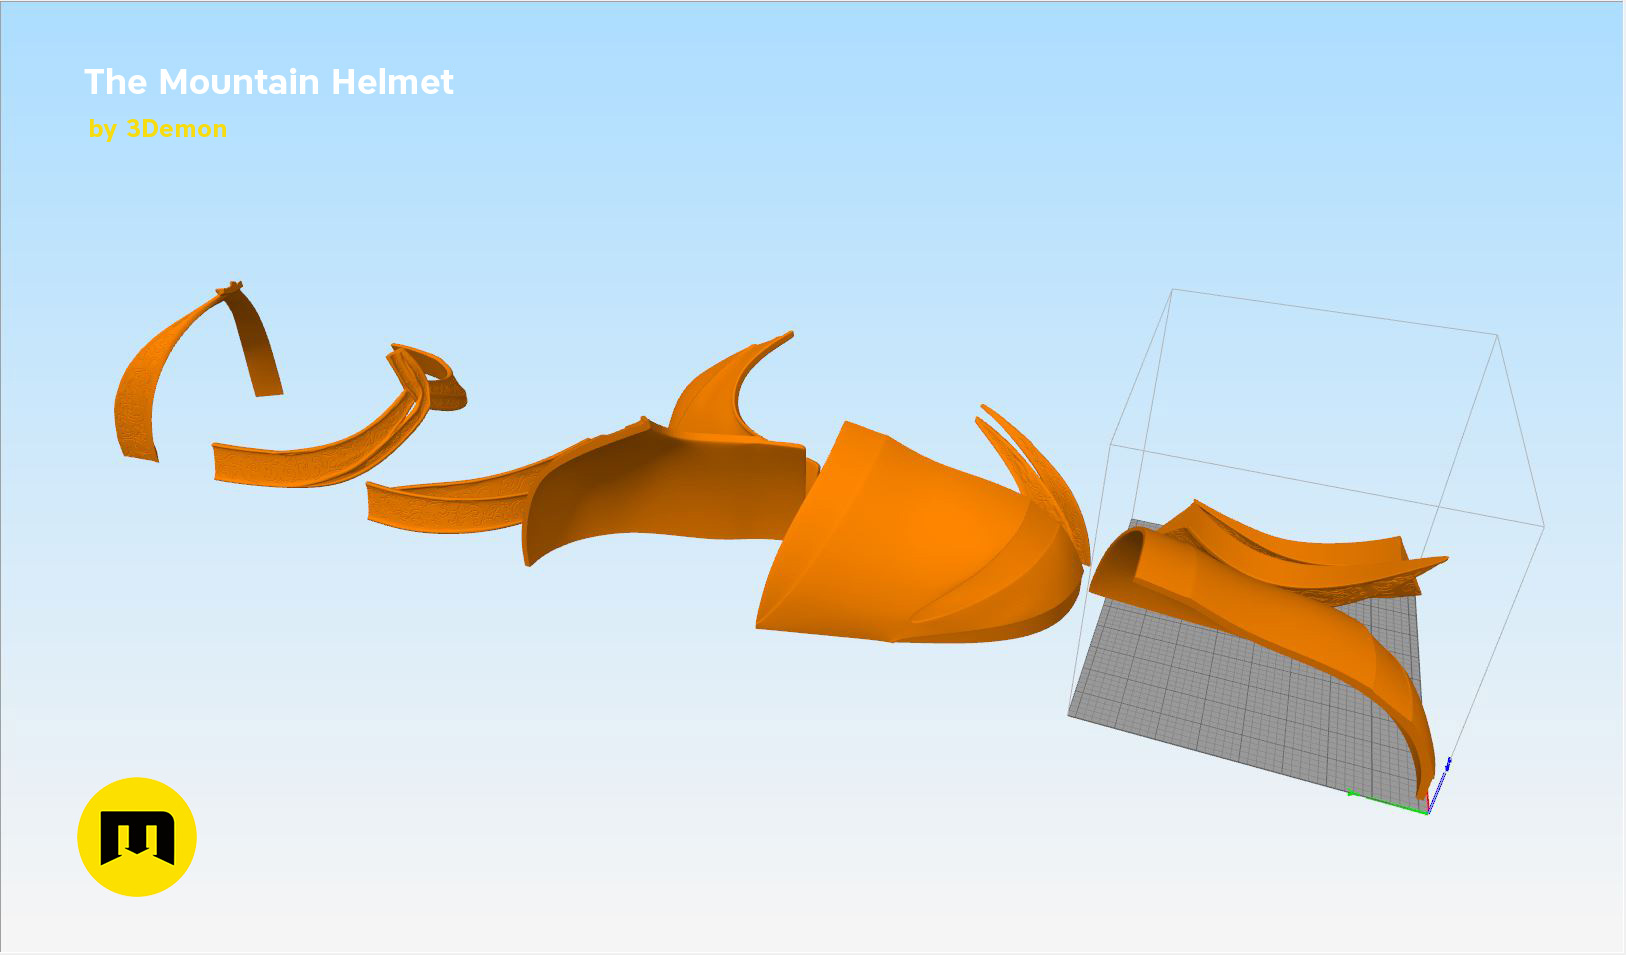 GoT-mountain-helmet-parts2.jpg Download STL file The Mountain Helmet – Game of Thrones • 3D printing model, 3D-mon